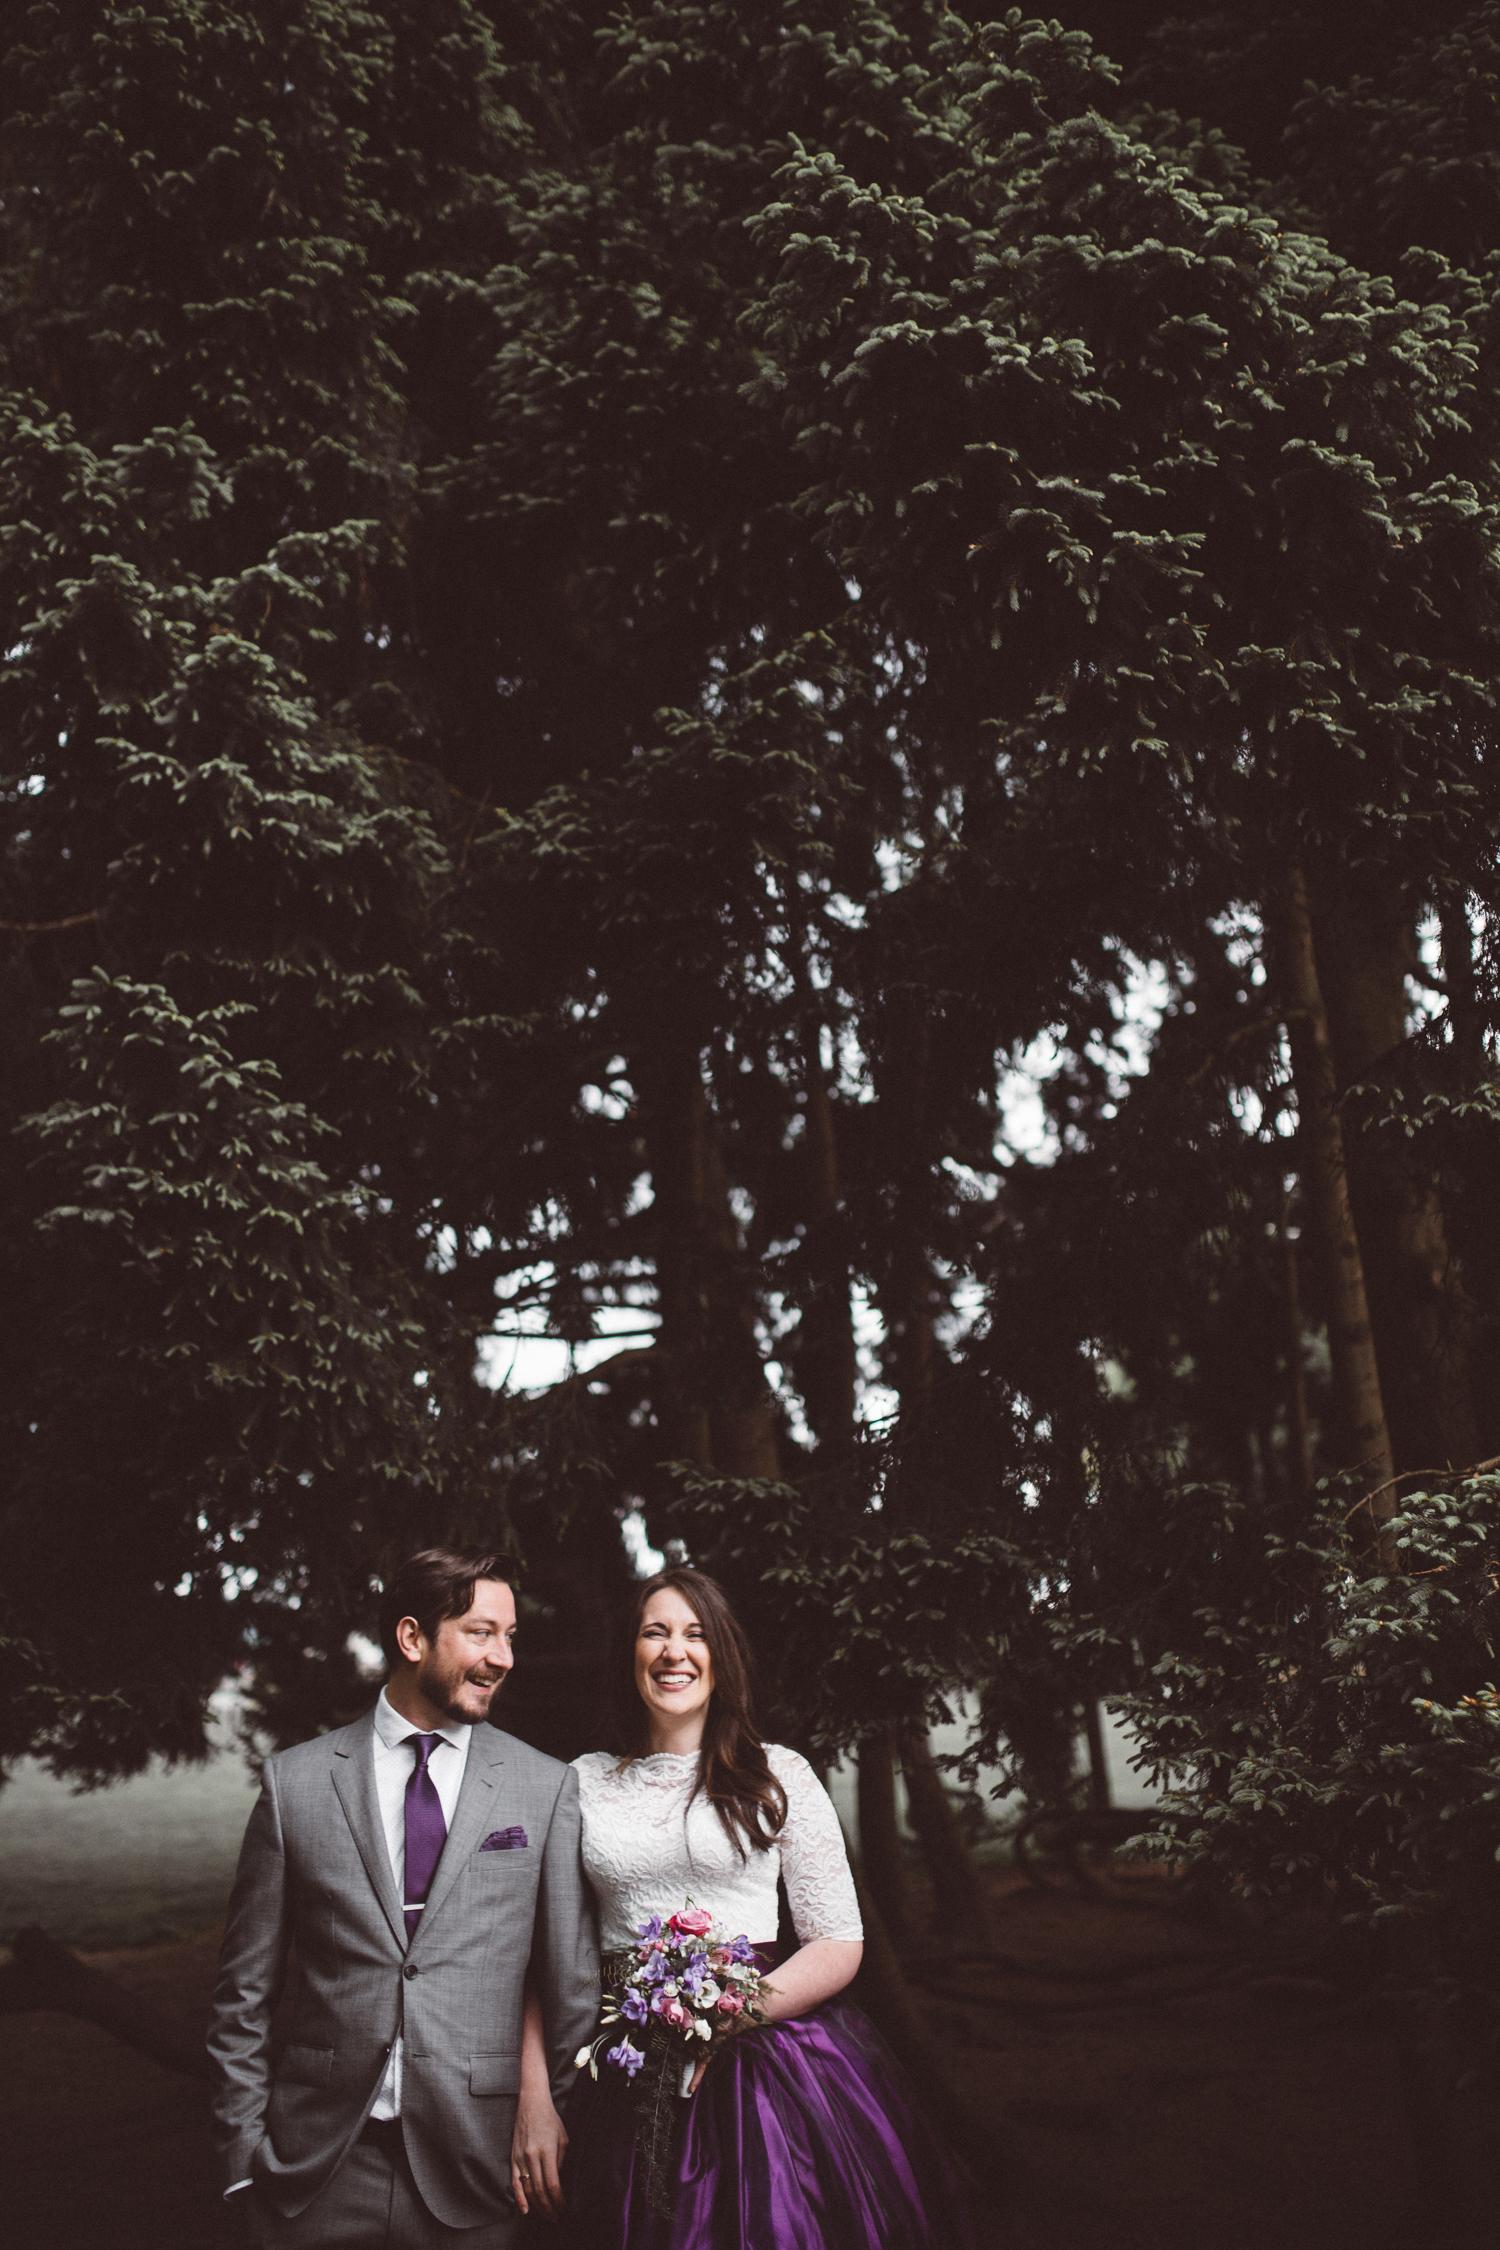 kdp_courtney&sean_wed_web-49.jpg